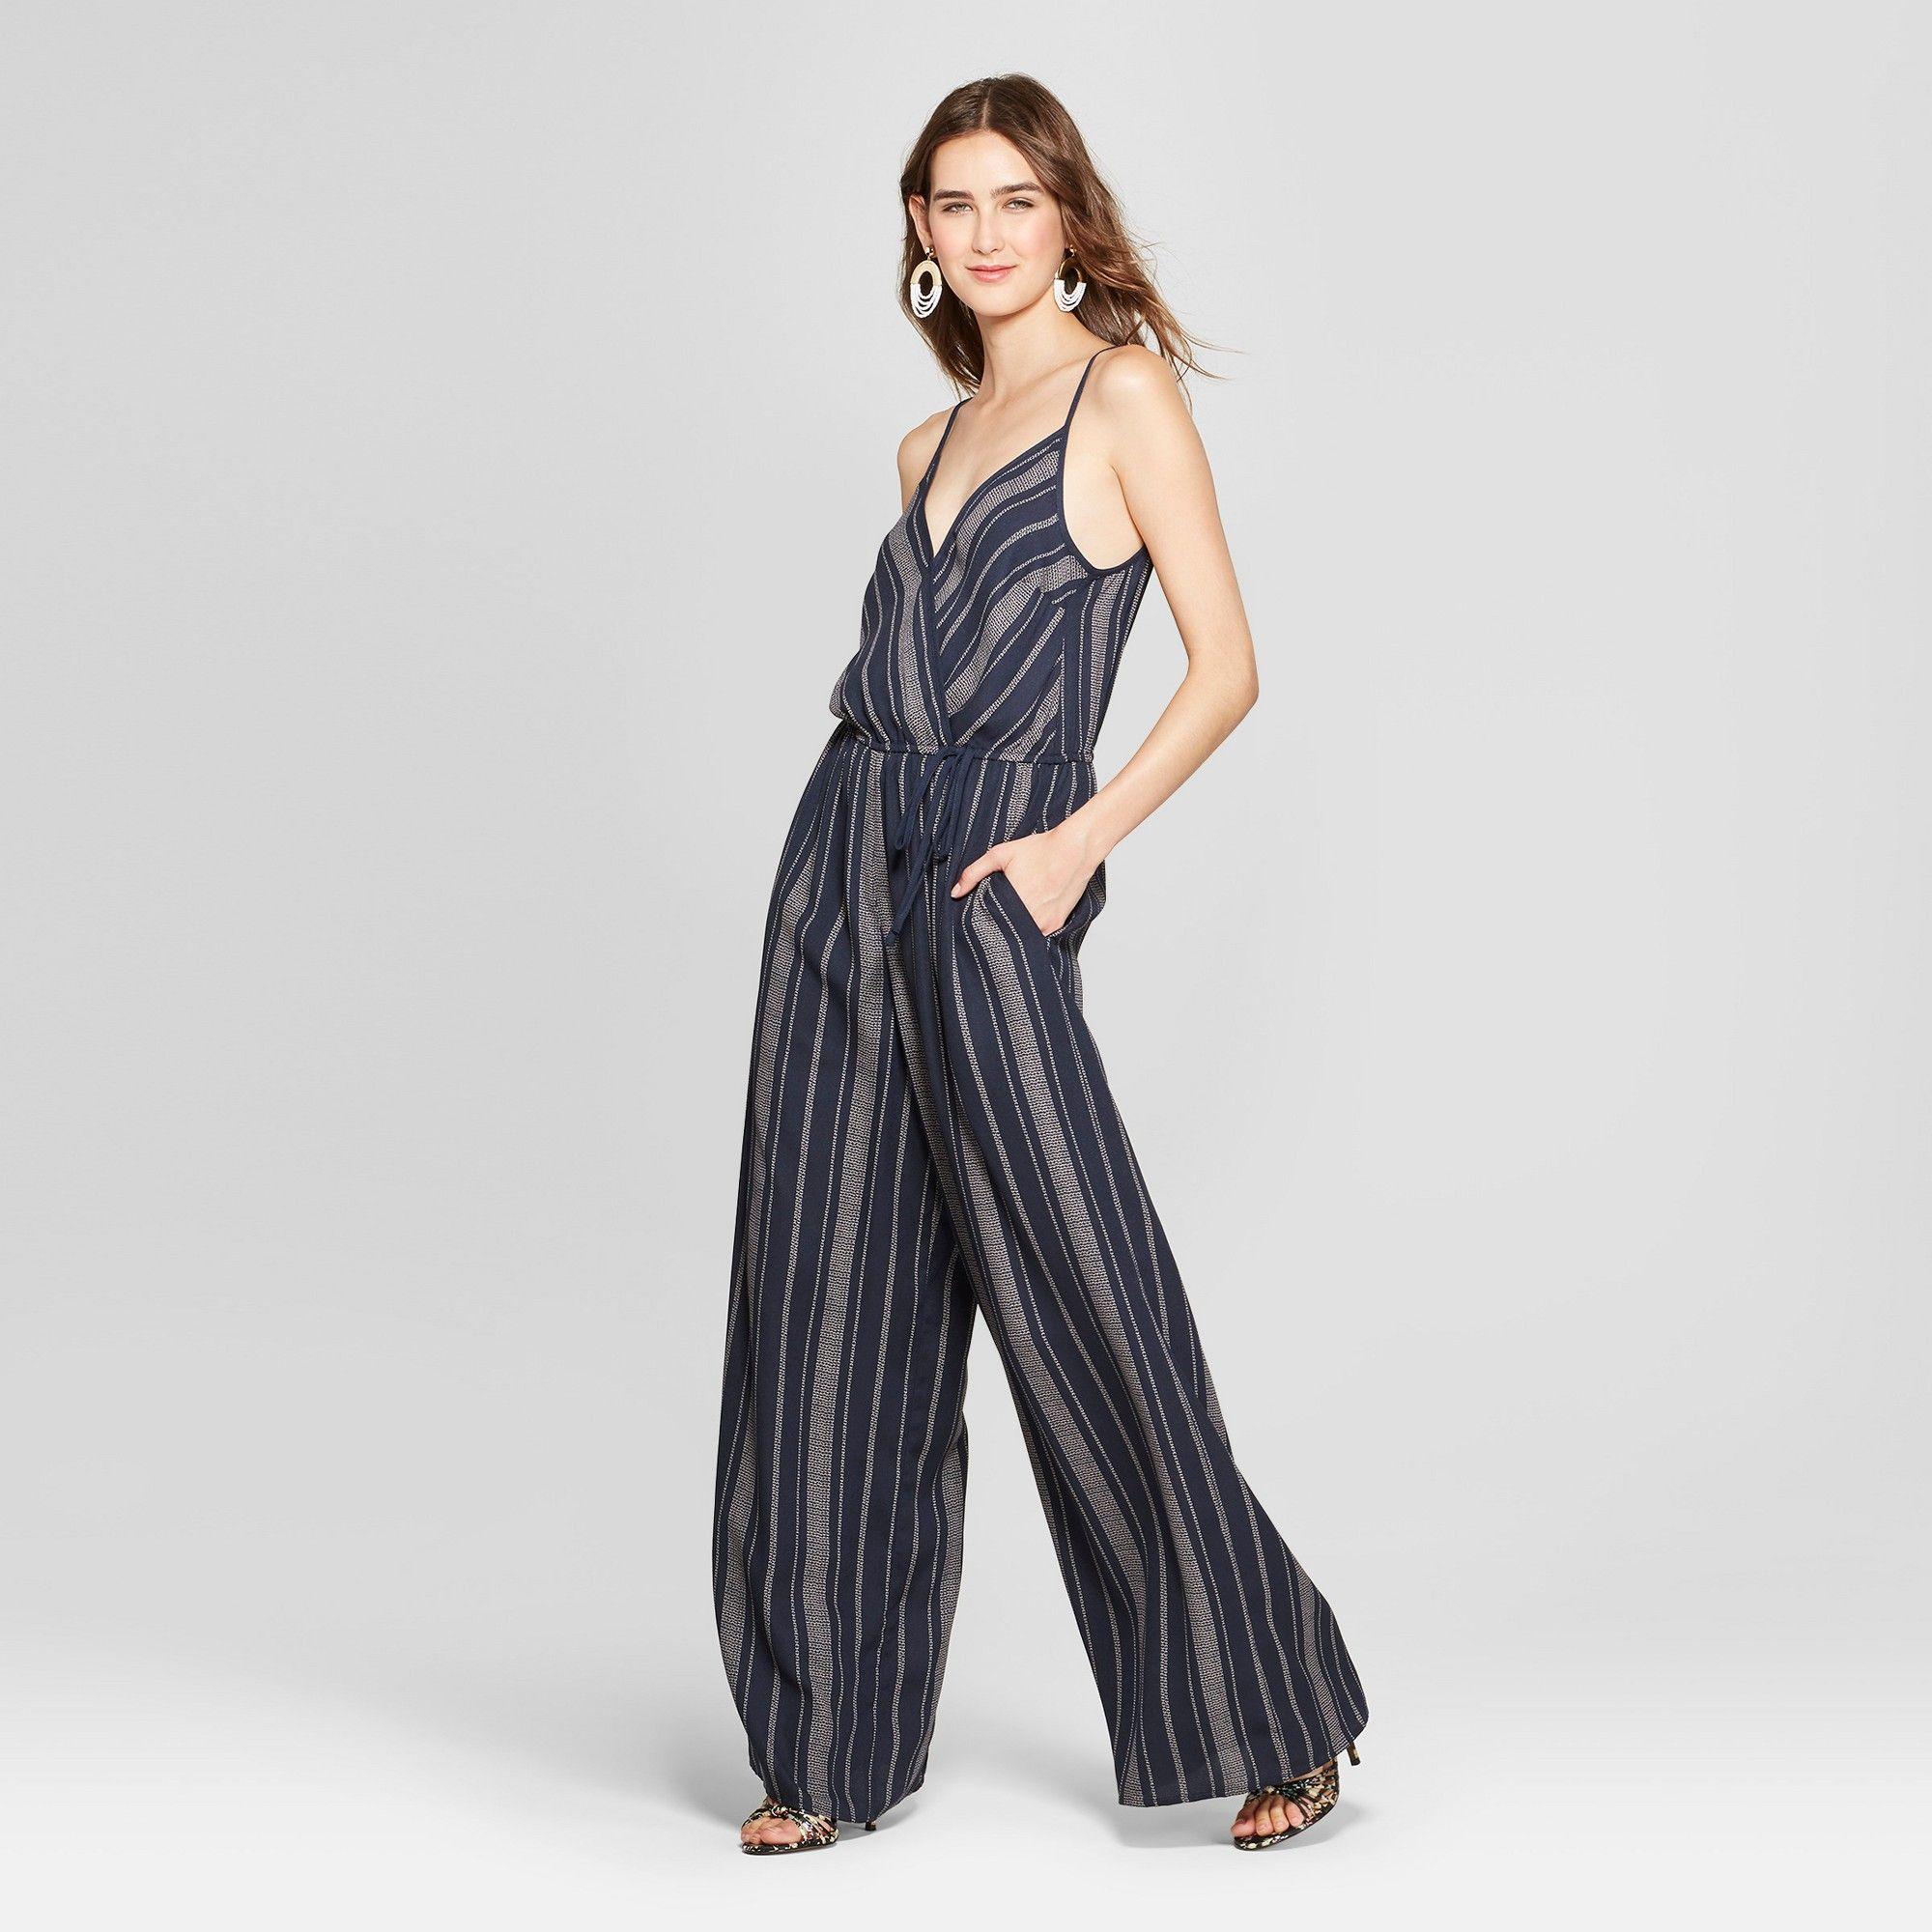 09d28a3af3c Women s Strappy Striped Wrap Jumpsuit - Xhilaration Navy Ivory Xxl ...